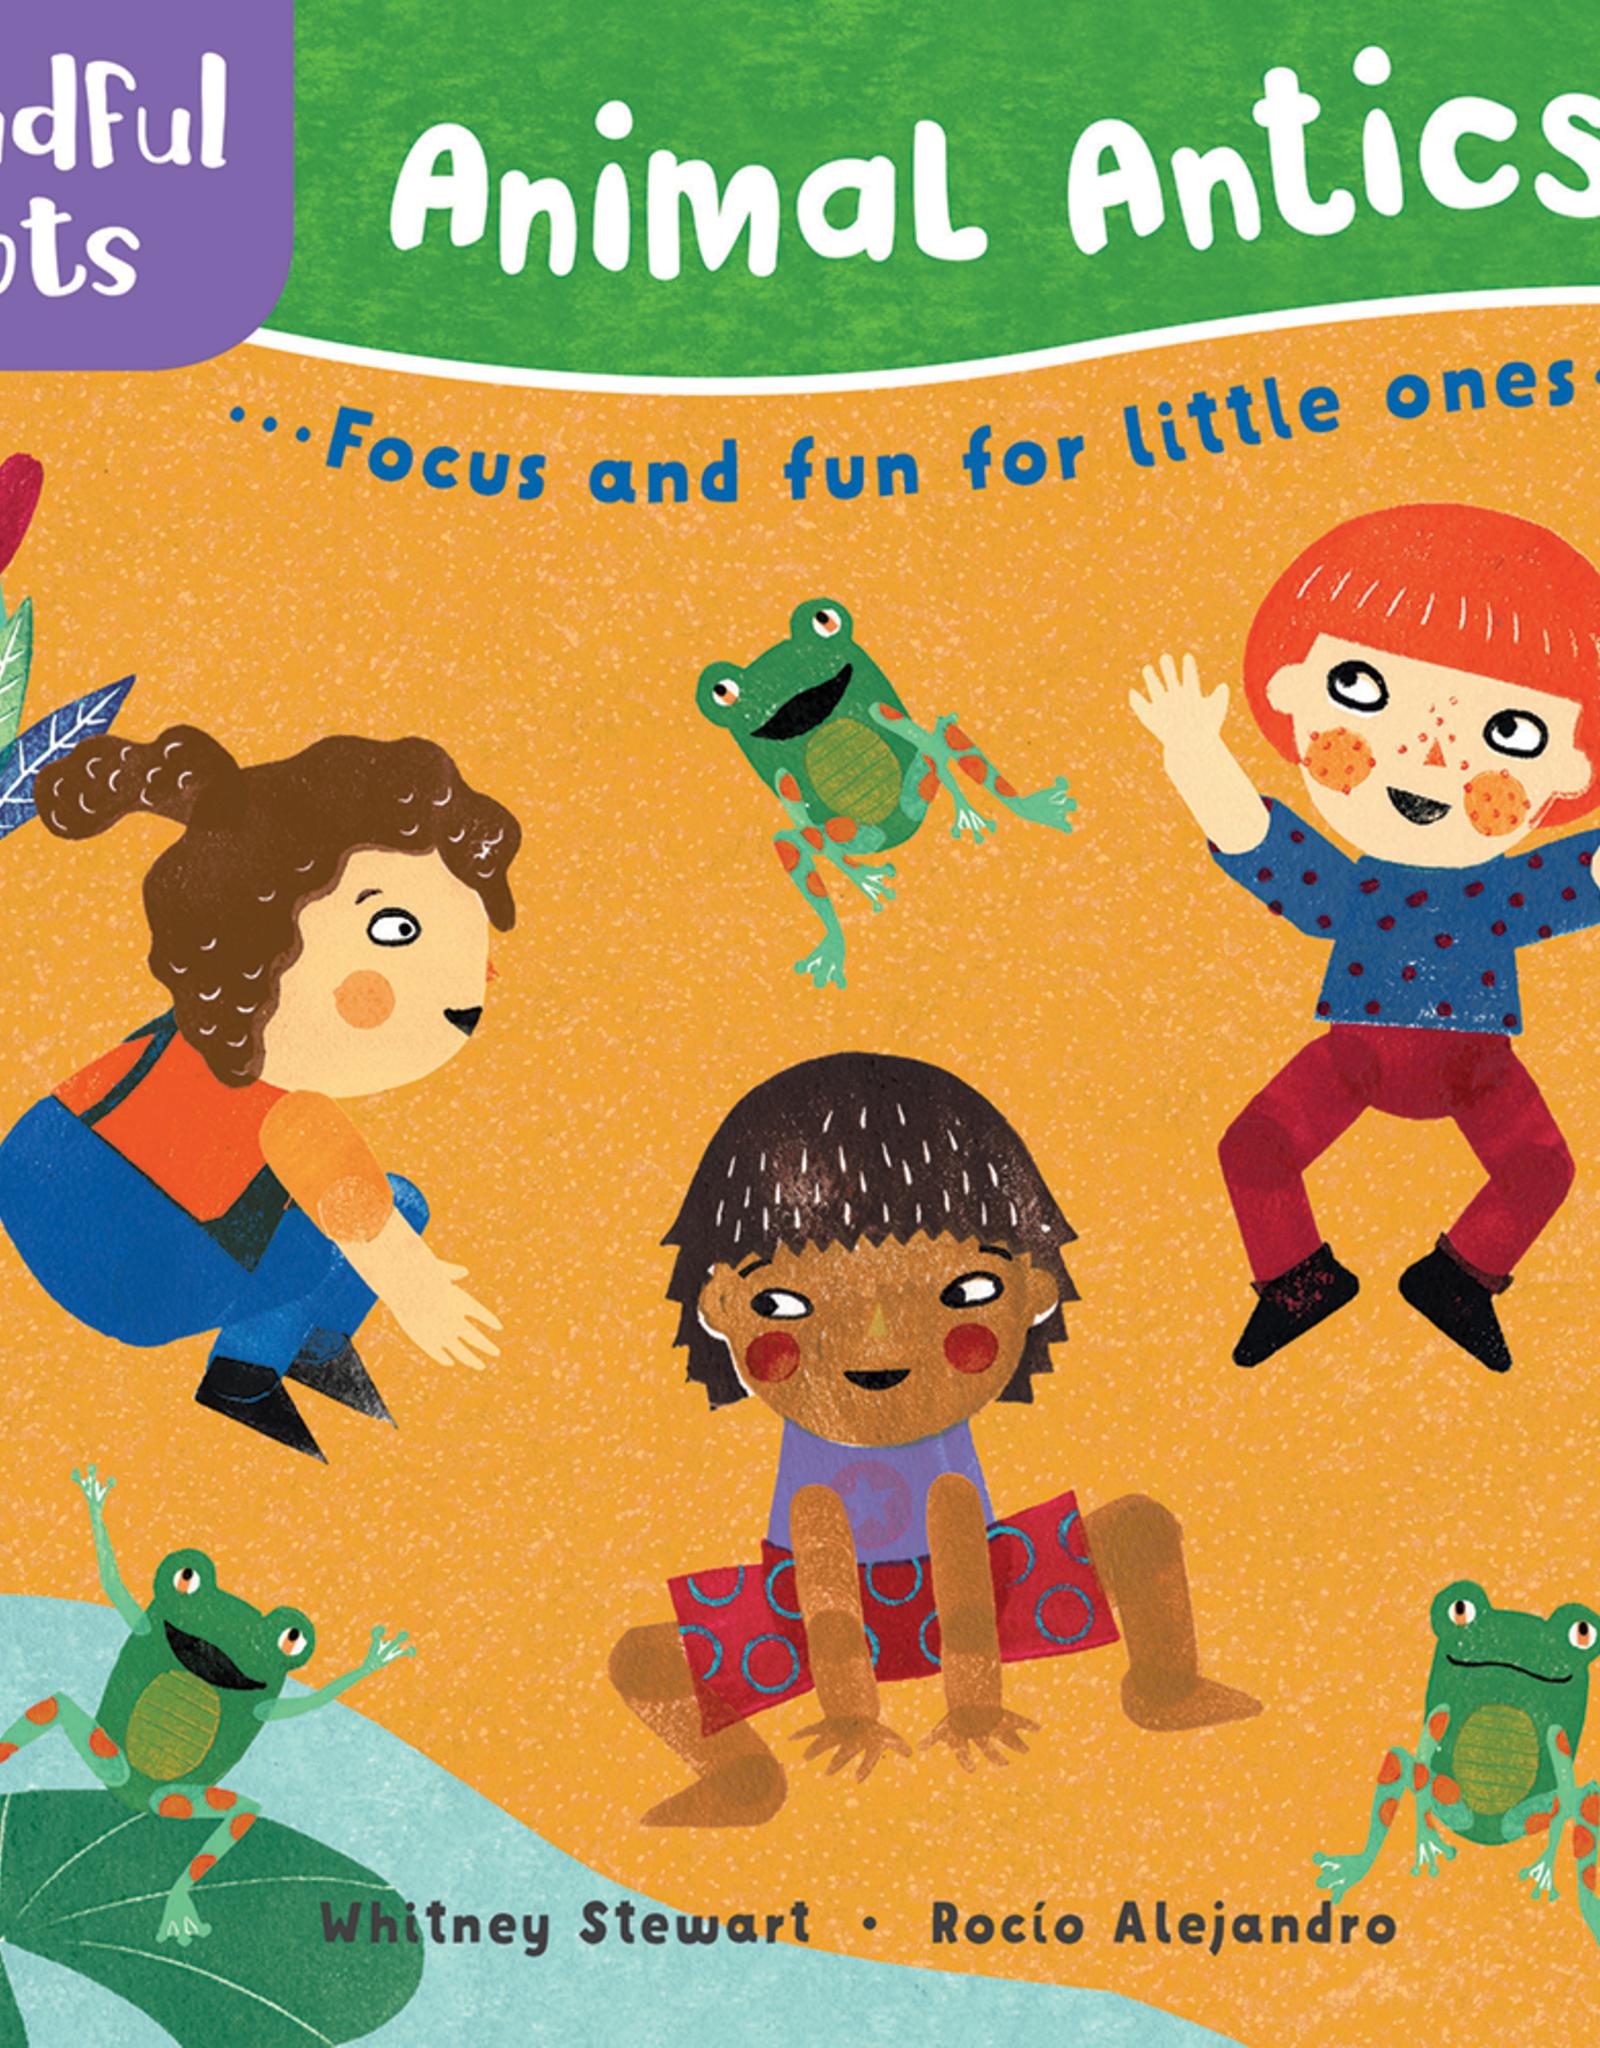 Barefoot Books Mindful Tots: Animal Antics